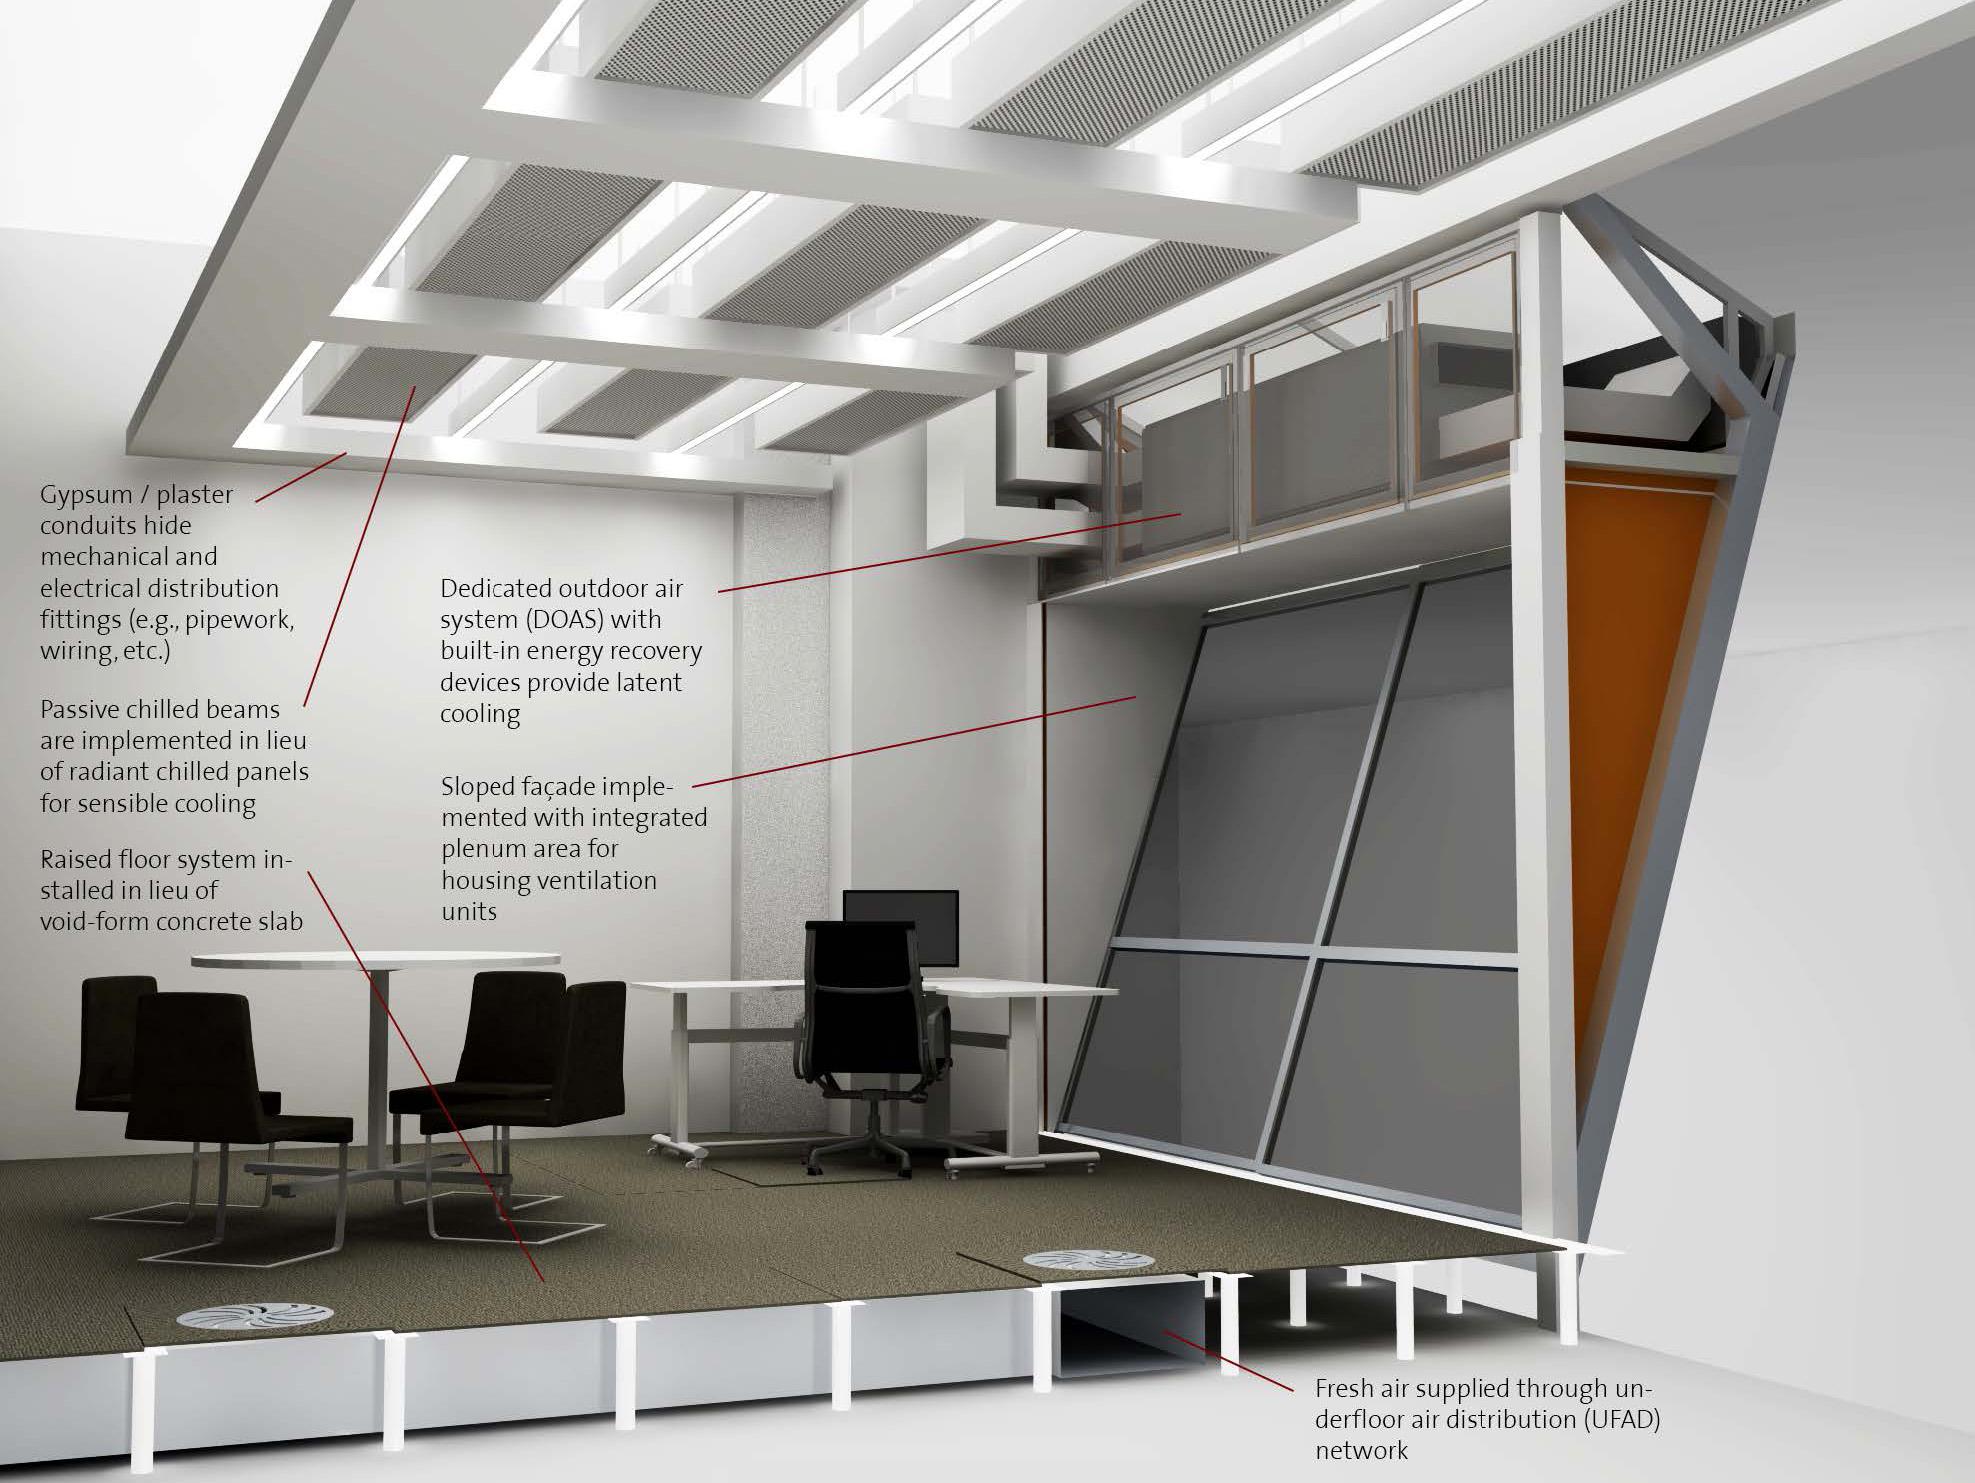 singapore's most energy efficient office2018 | eth zurich